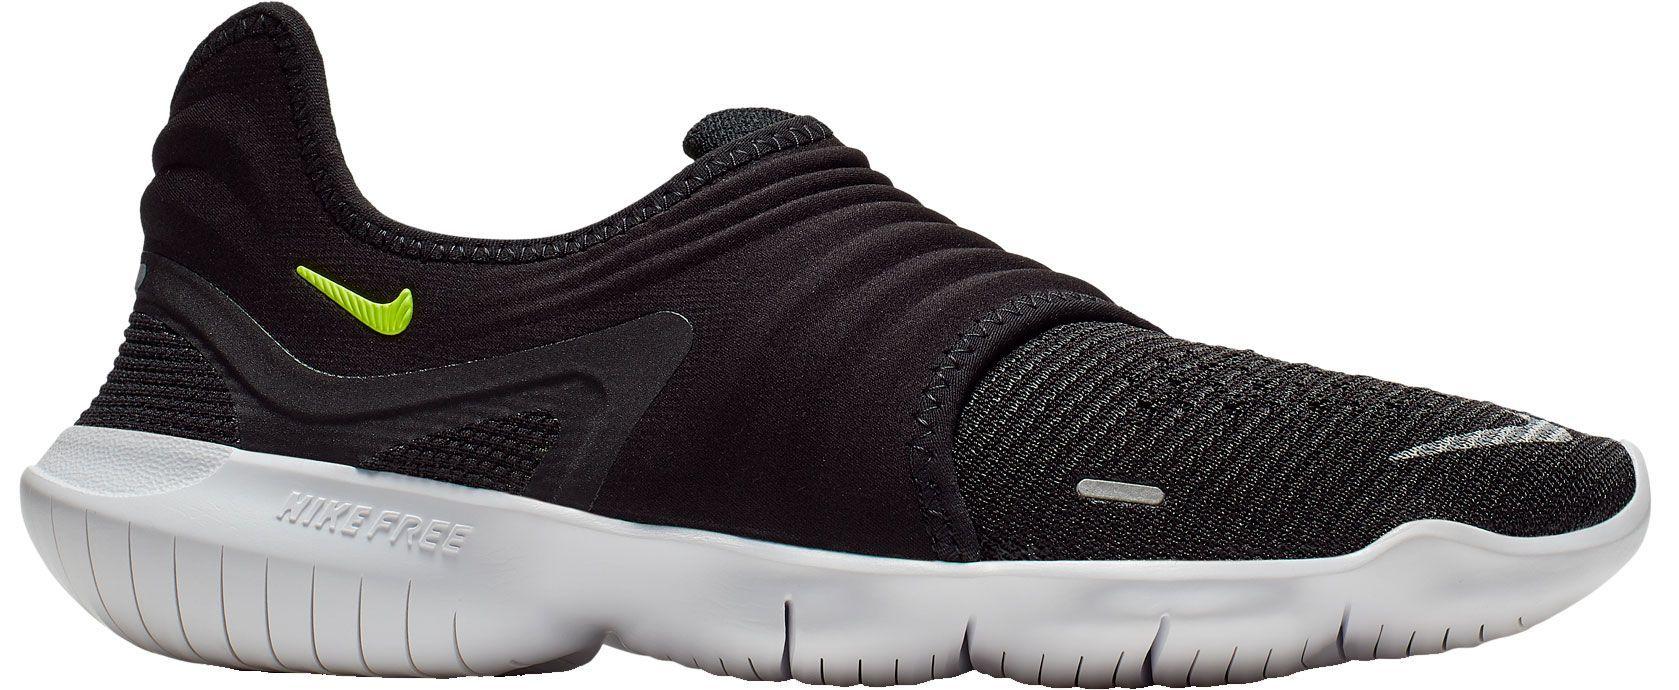 release date 2aa2a af8f1 Nike Women's Free RN Flyknit 3.0 Running Shoes in 2019 ...